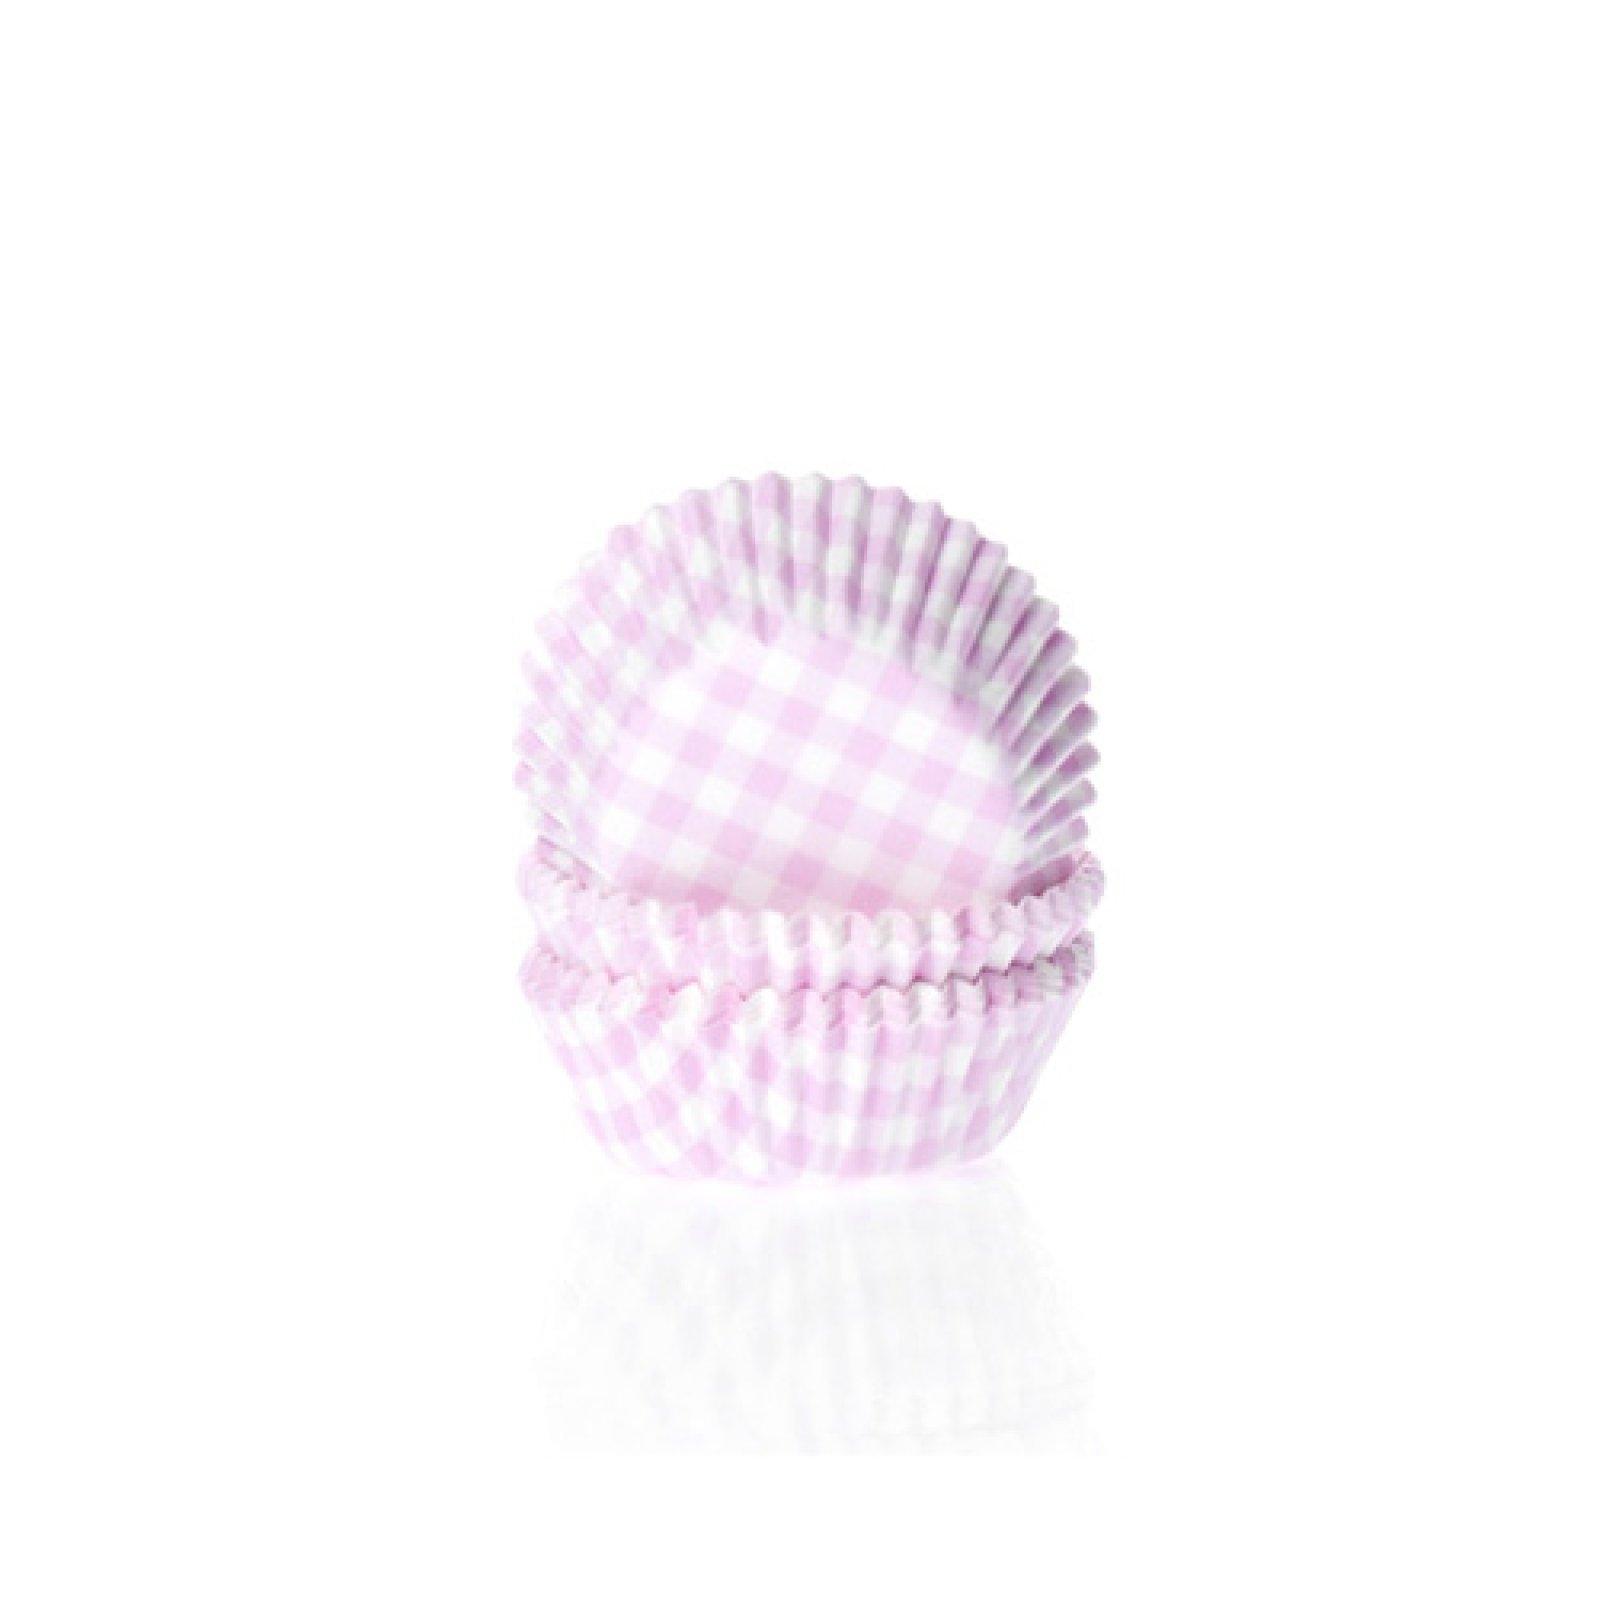 Mini Muffinförmchen, rosa weiß kariert